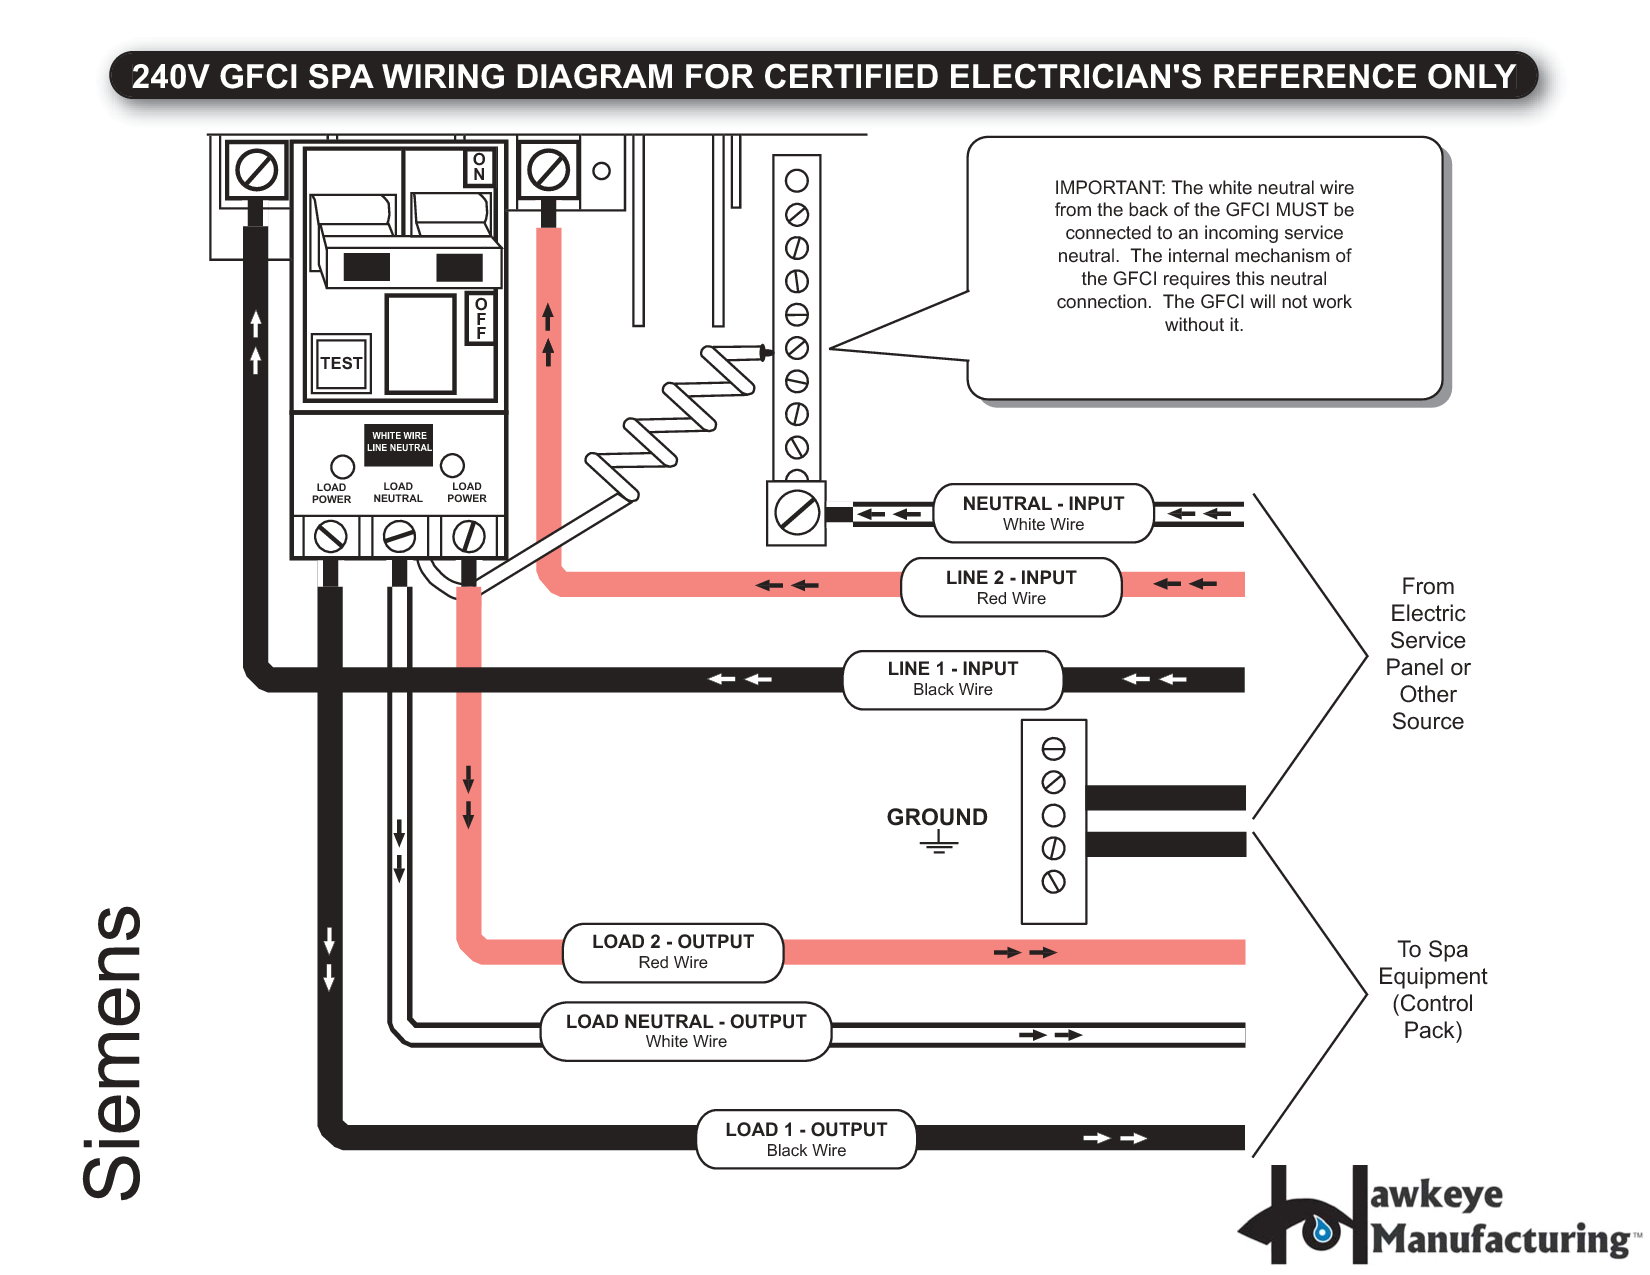 spa wire diagram wiring diagram usergatsby spa wiring diagram wiring diagram spa wire diagram